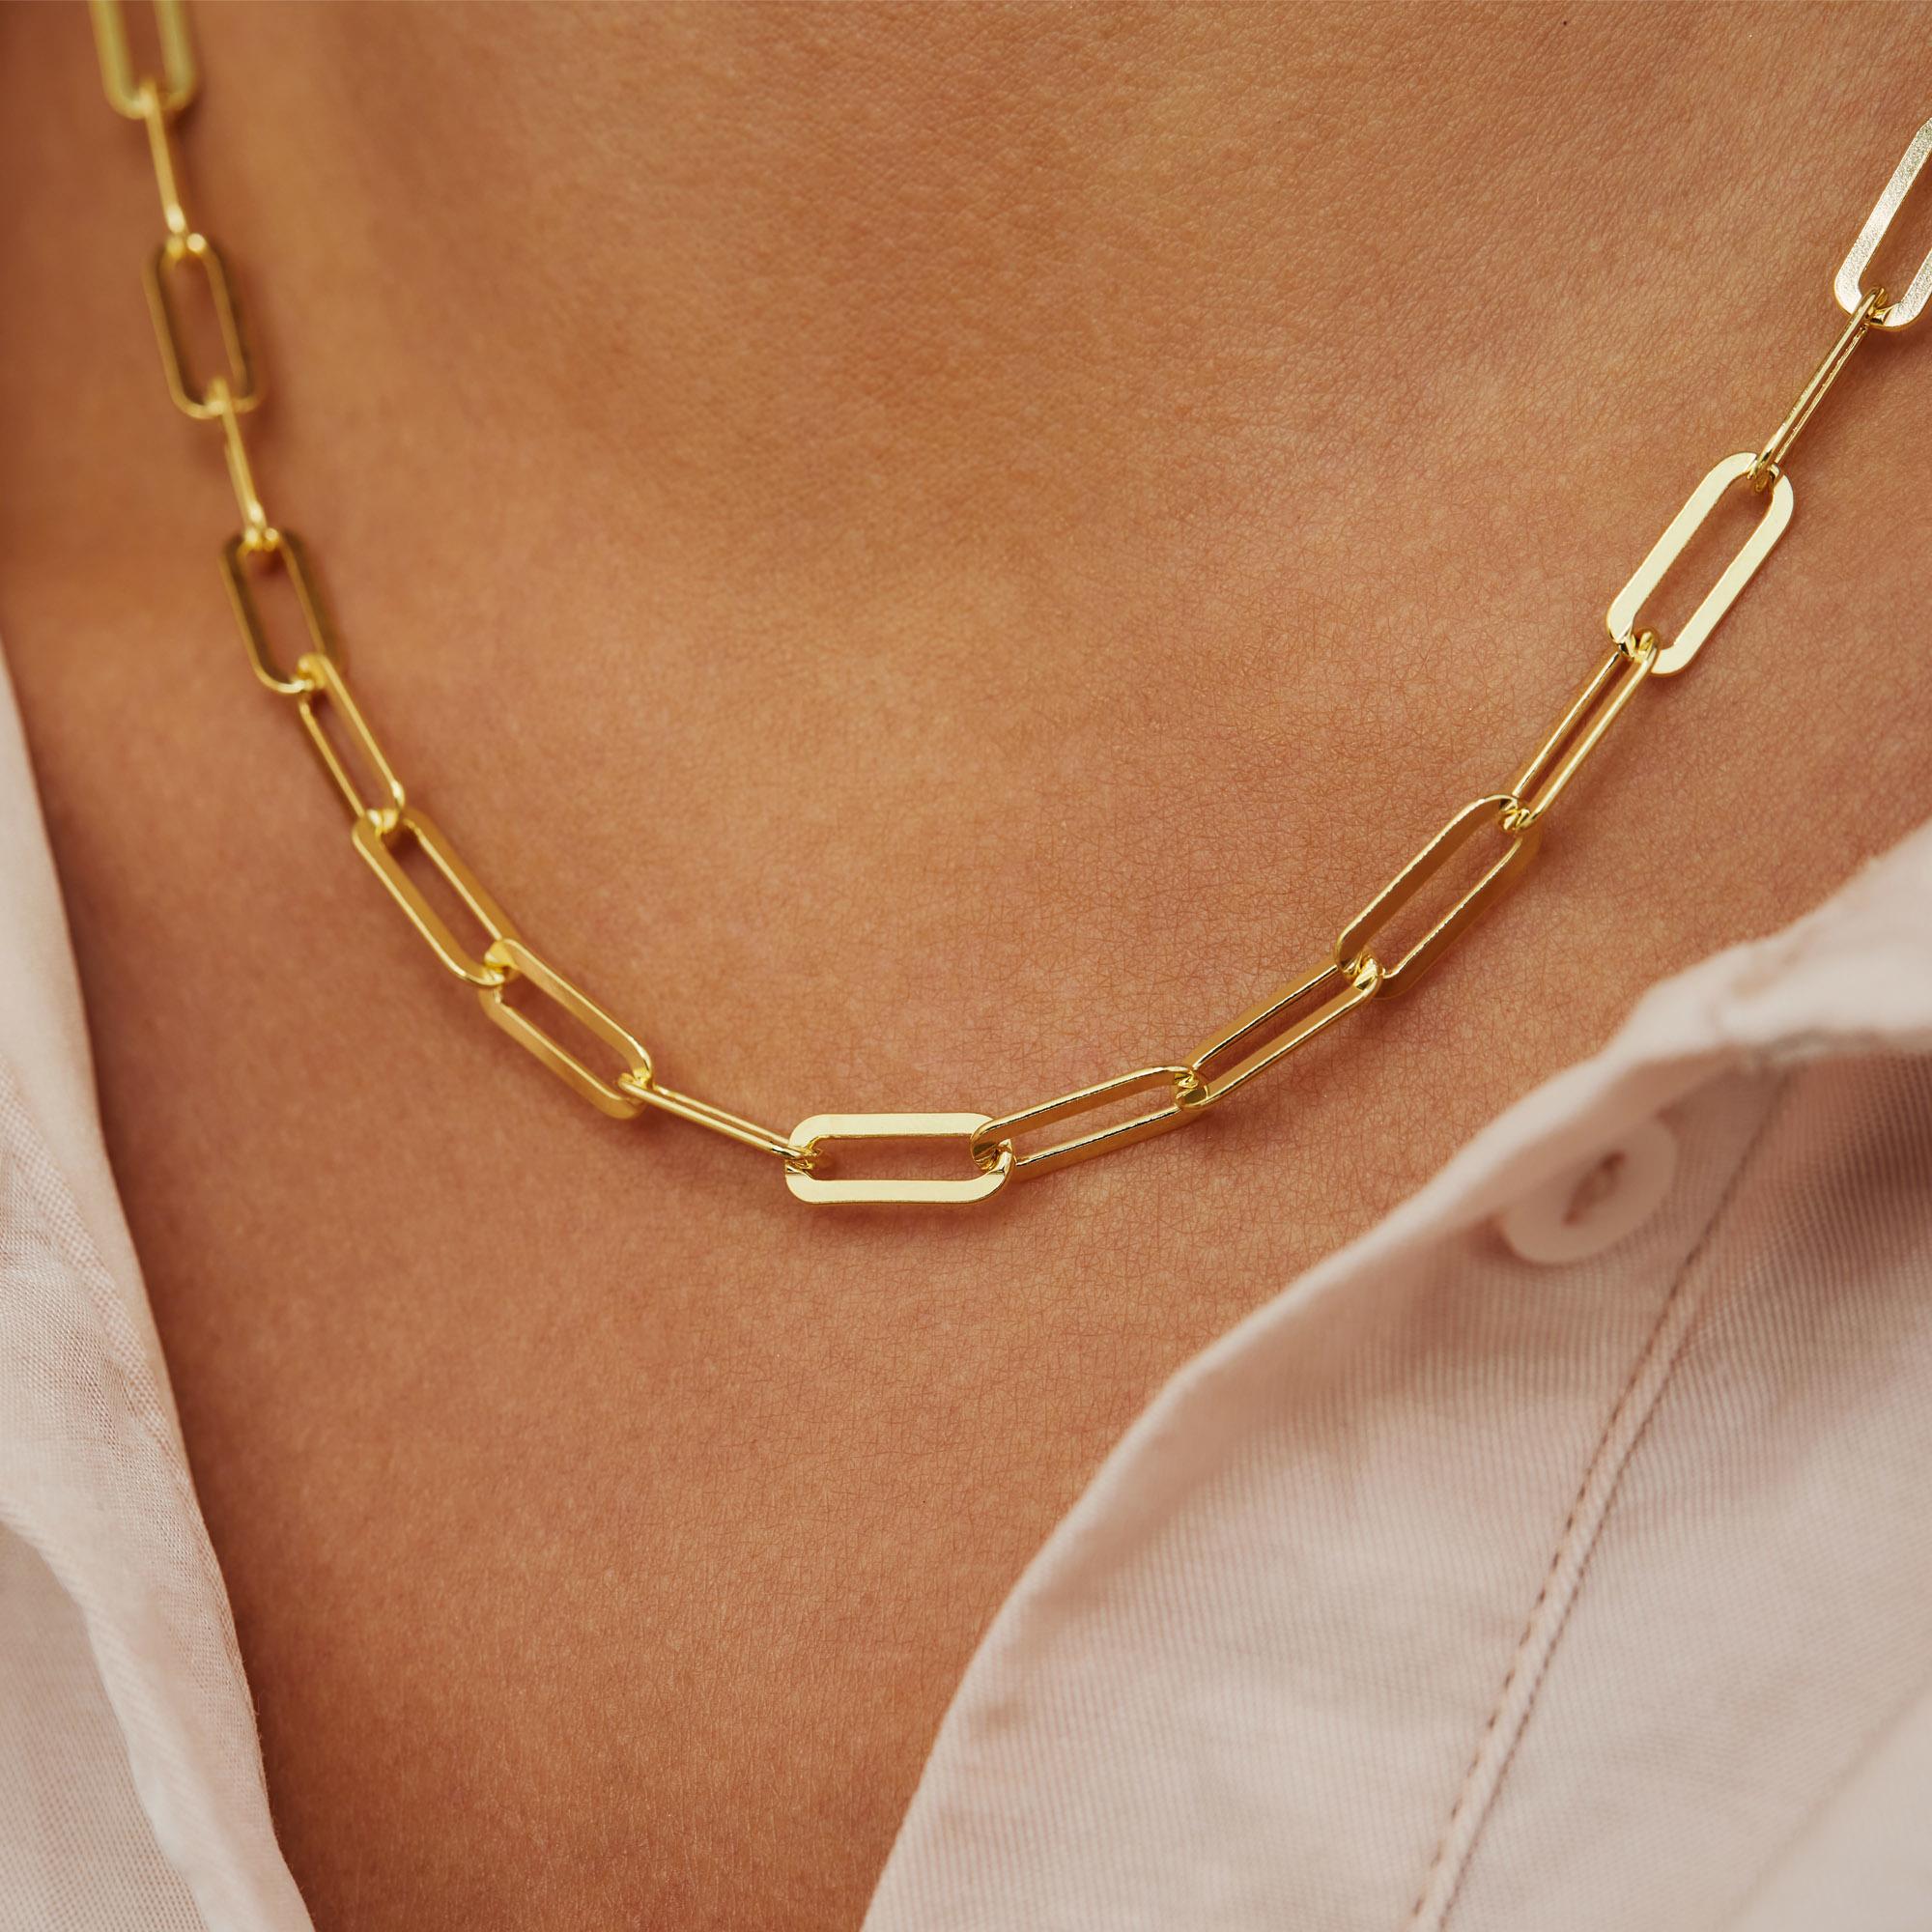 Selected Jewels Emma Jolie 925 Sterling Silber goldfarbenes Kette